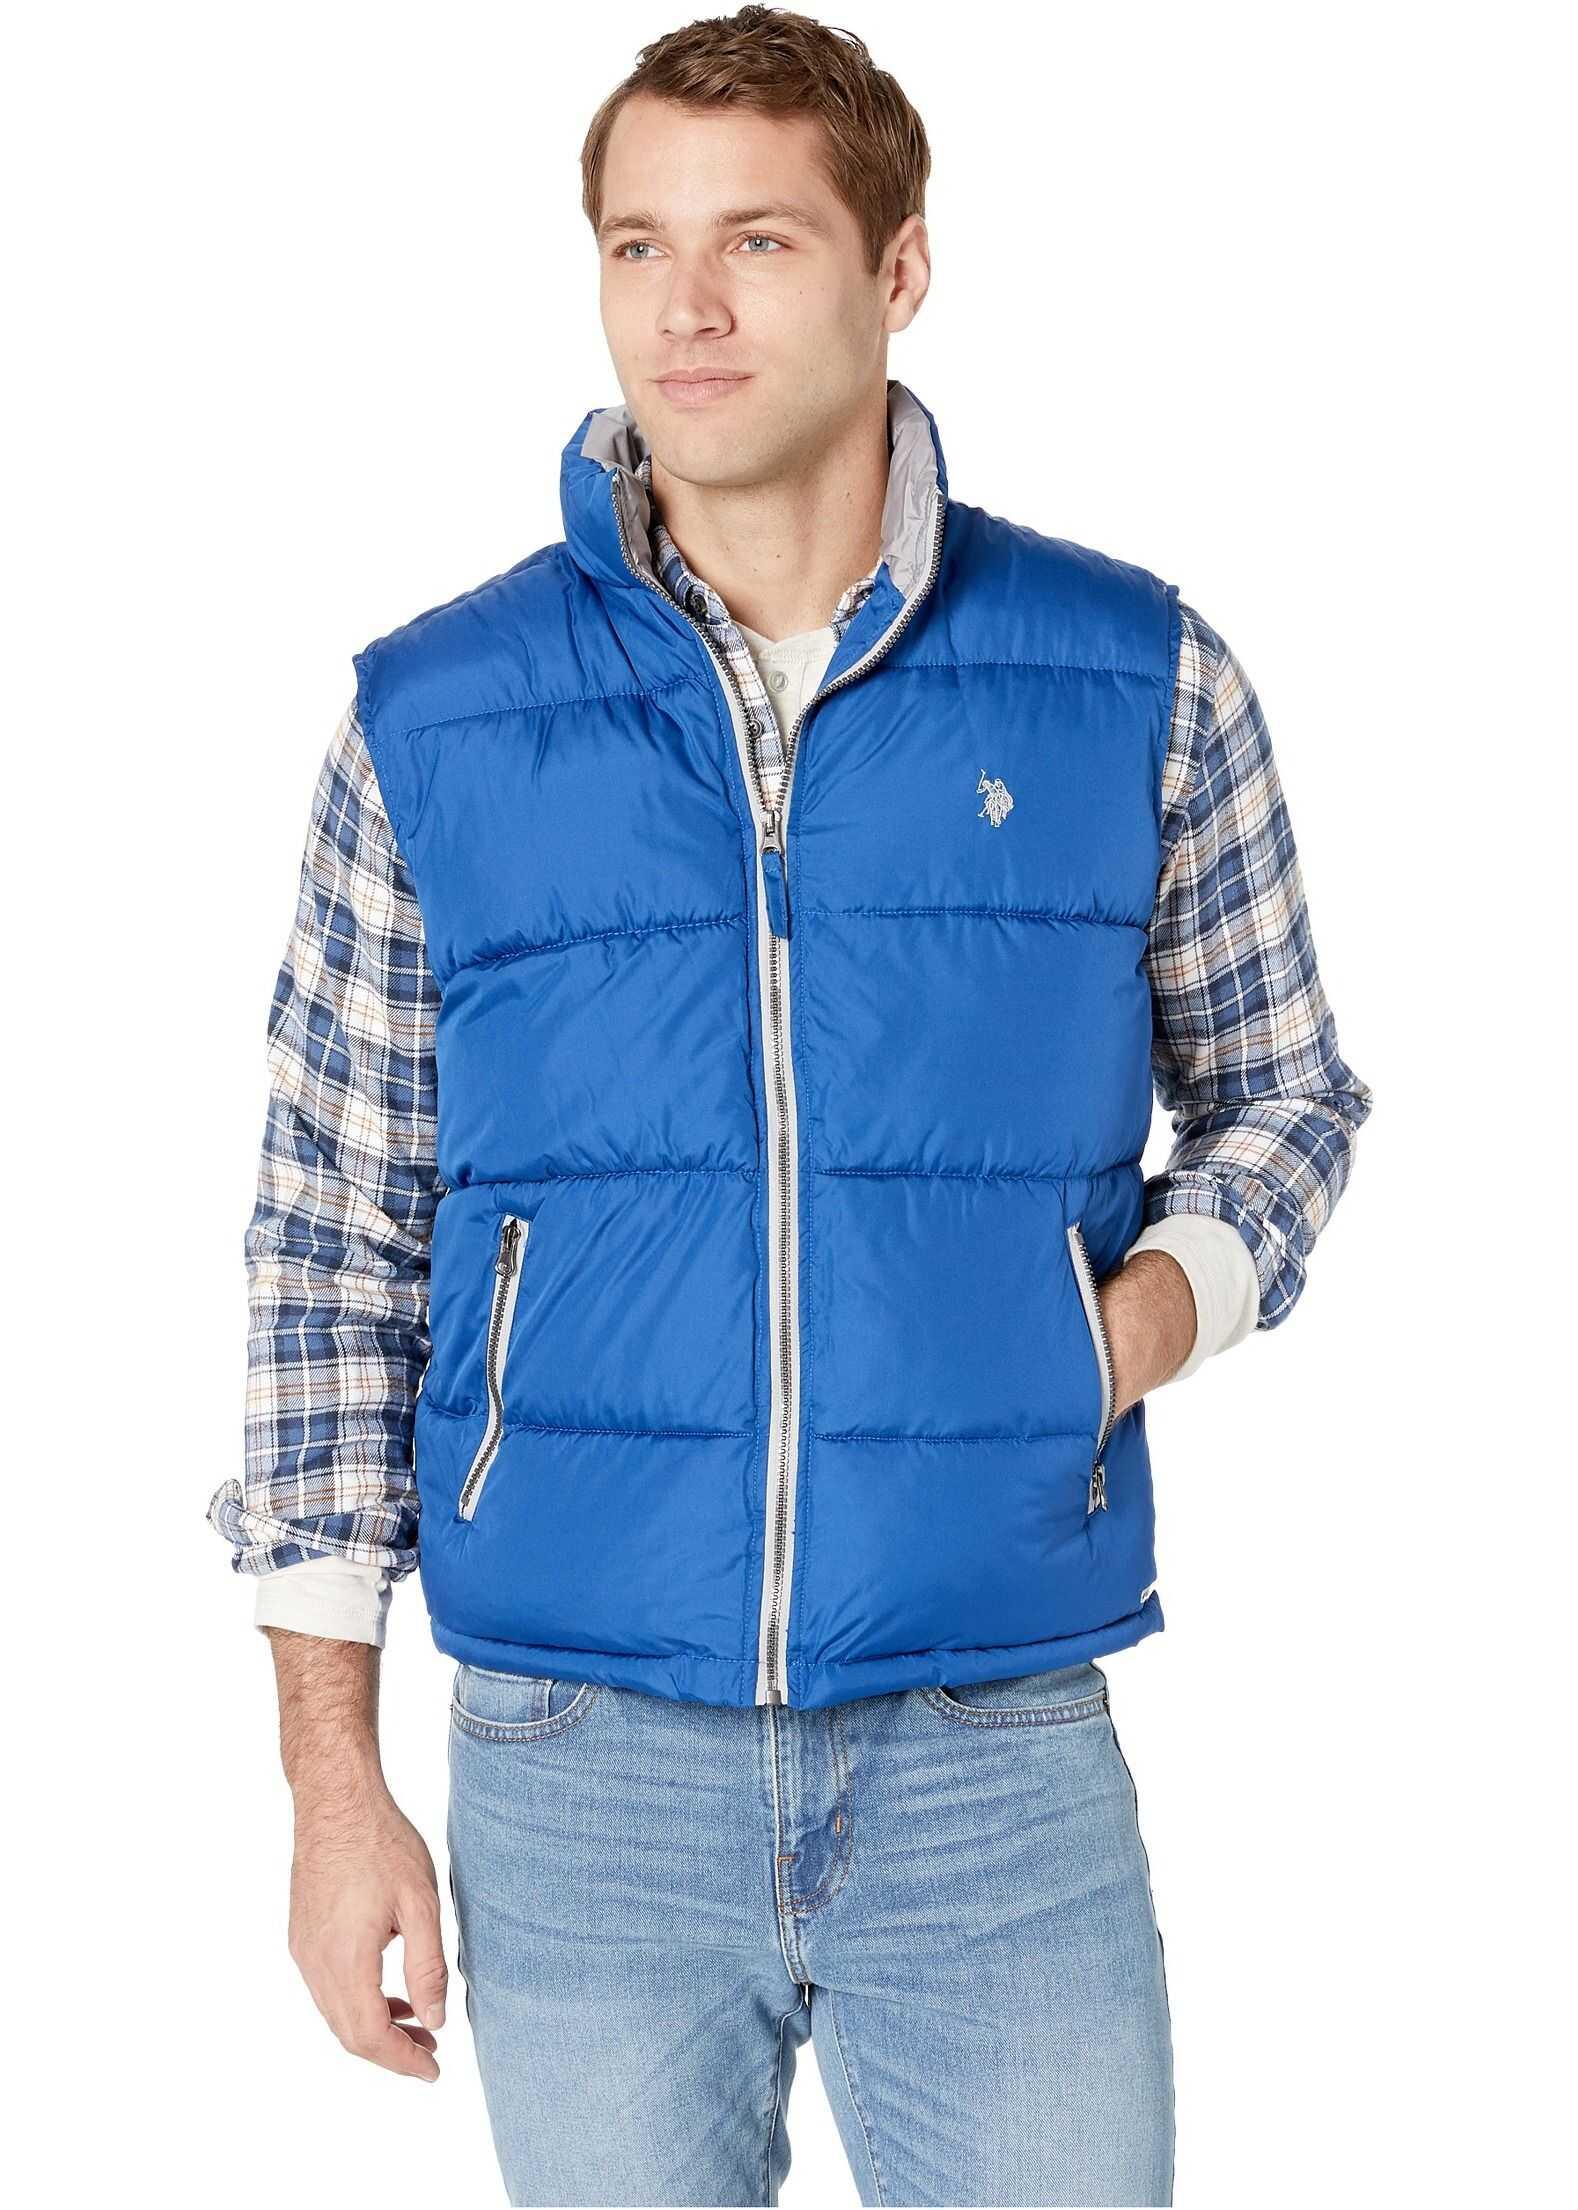 U.S. POLO ASSN. Performance Vest Blue/White